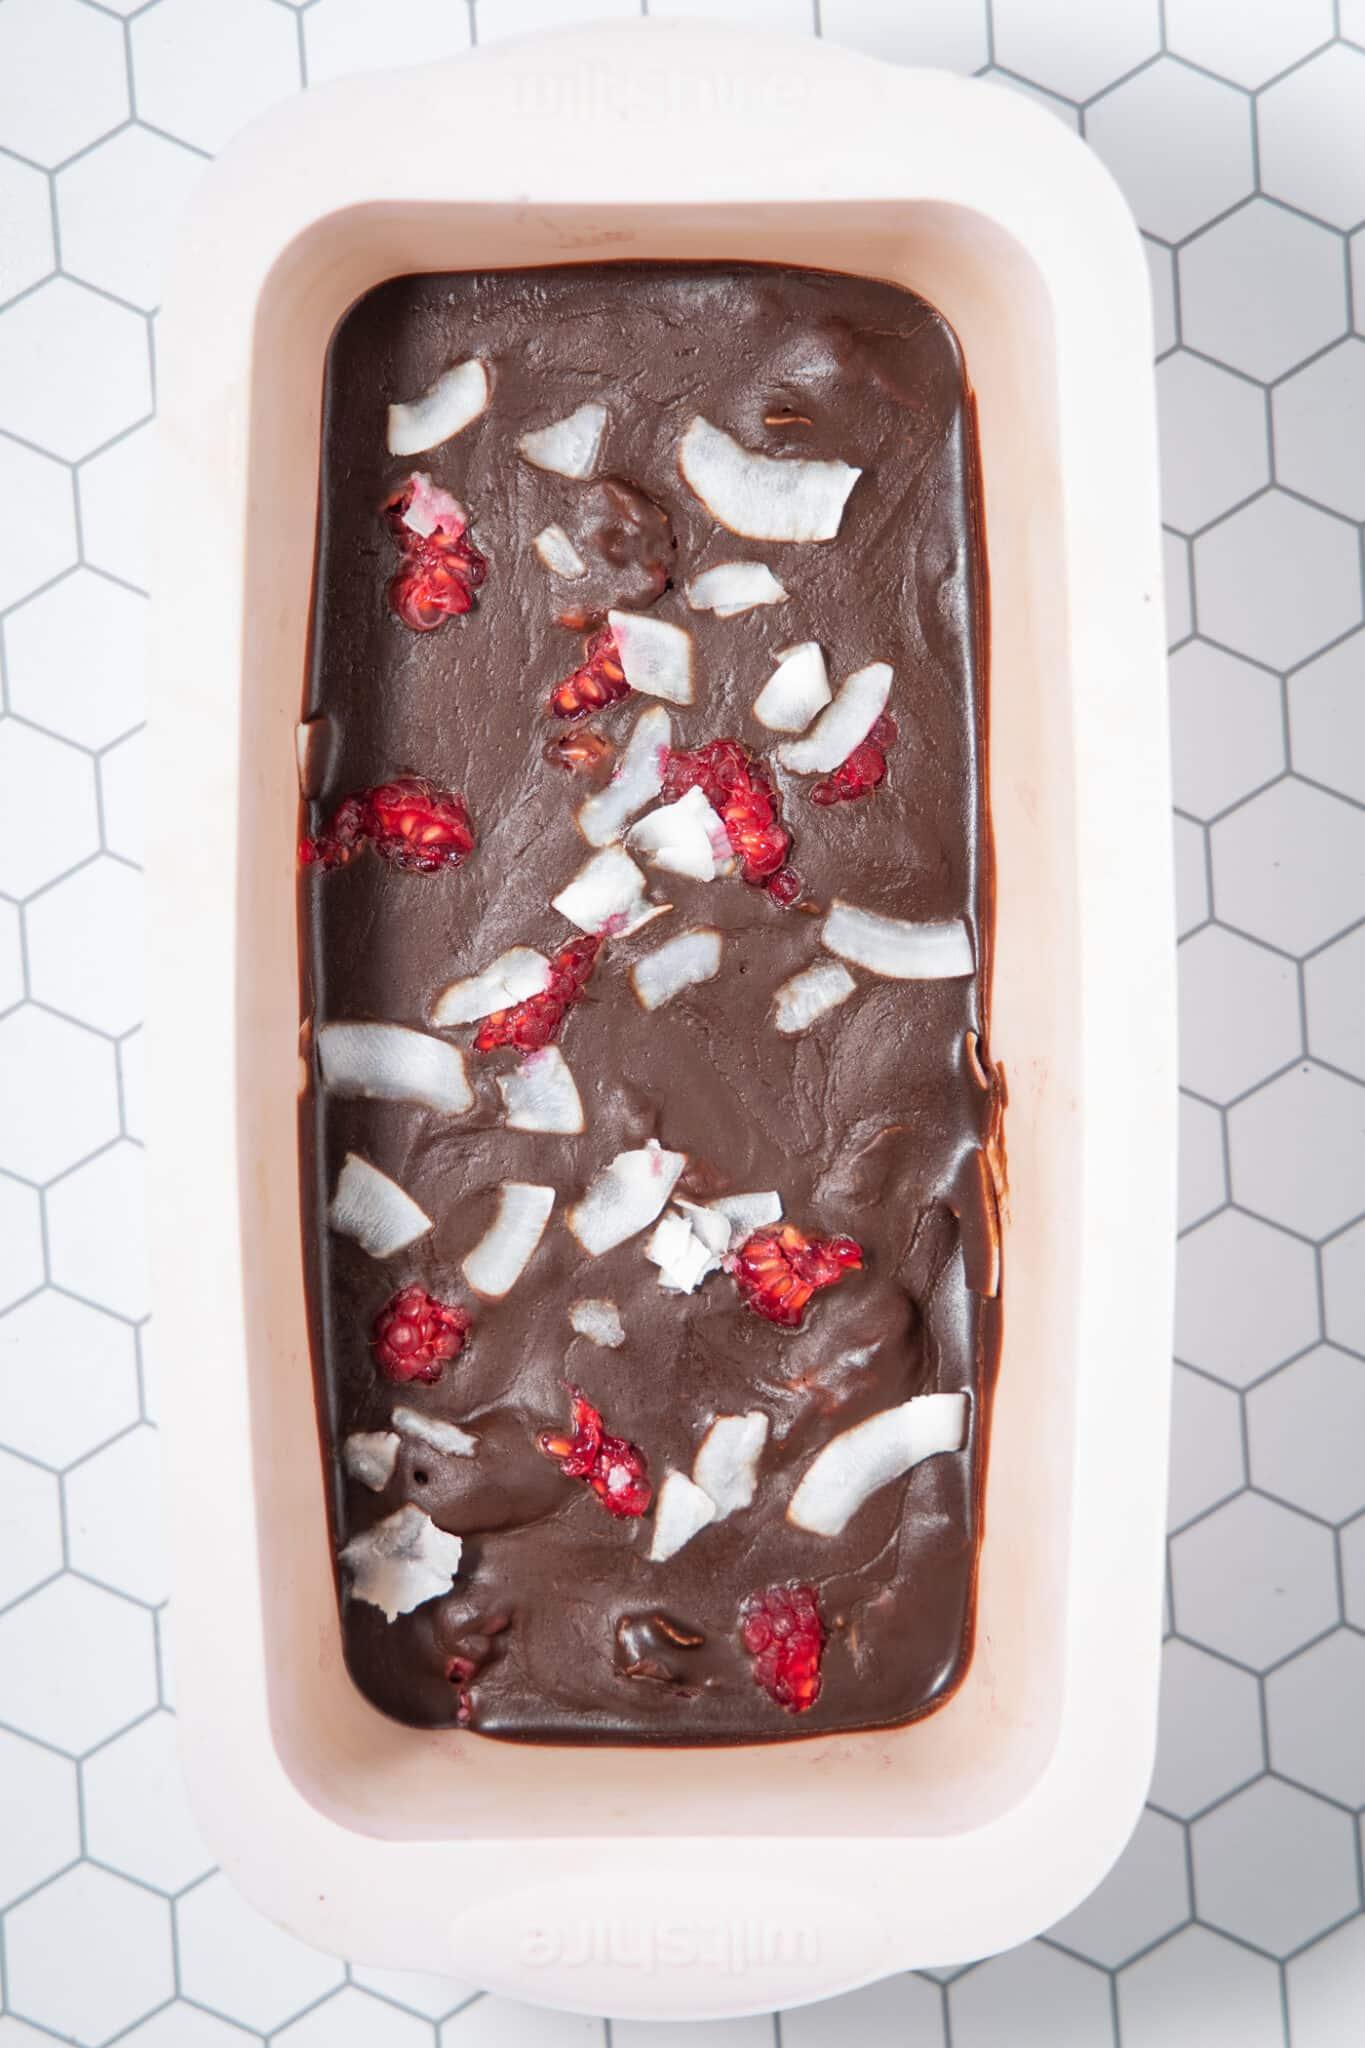 photo of raspberry ripe that has set in the freezer